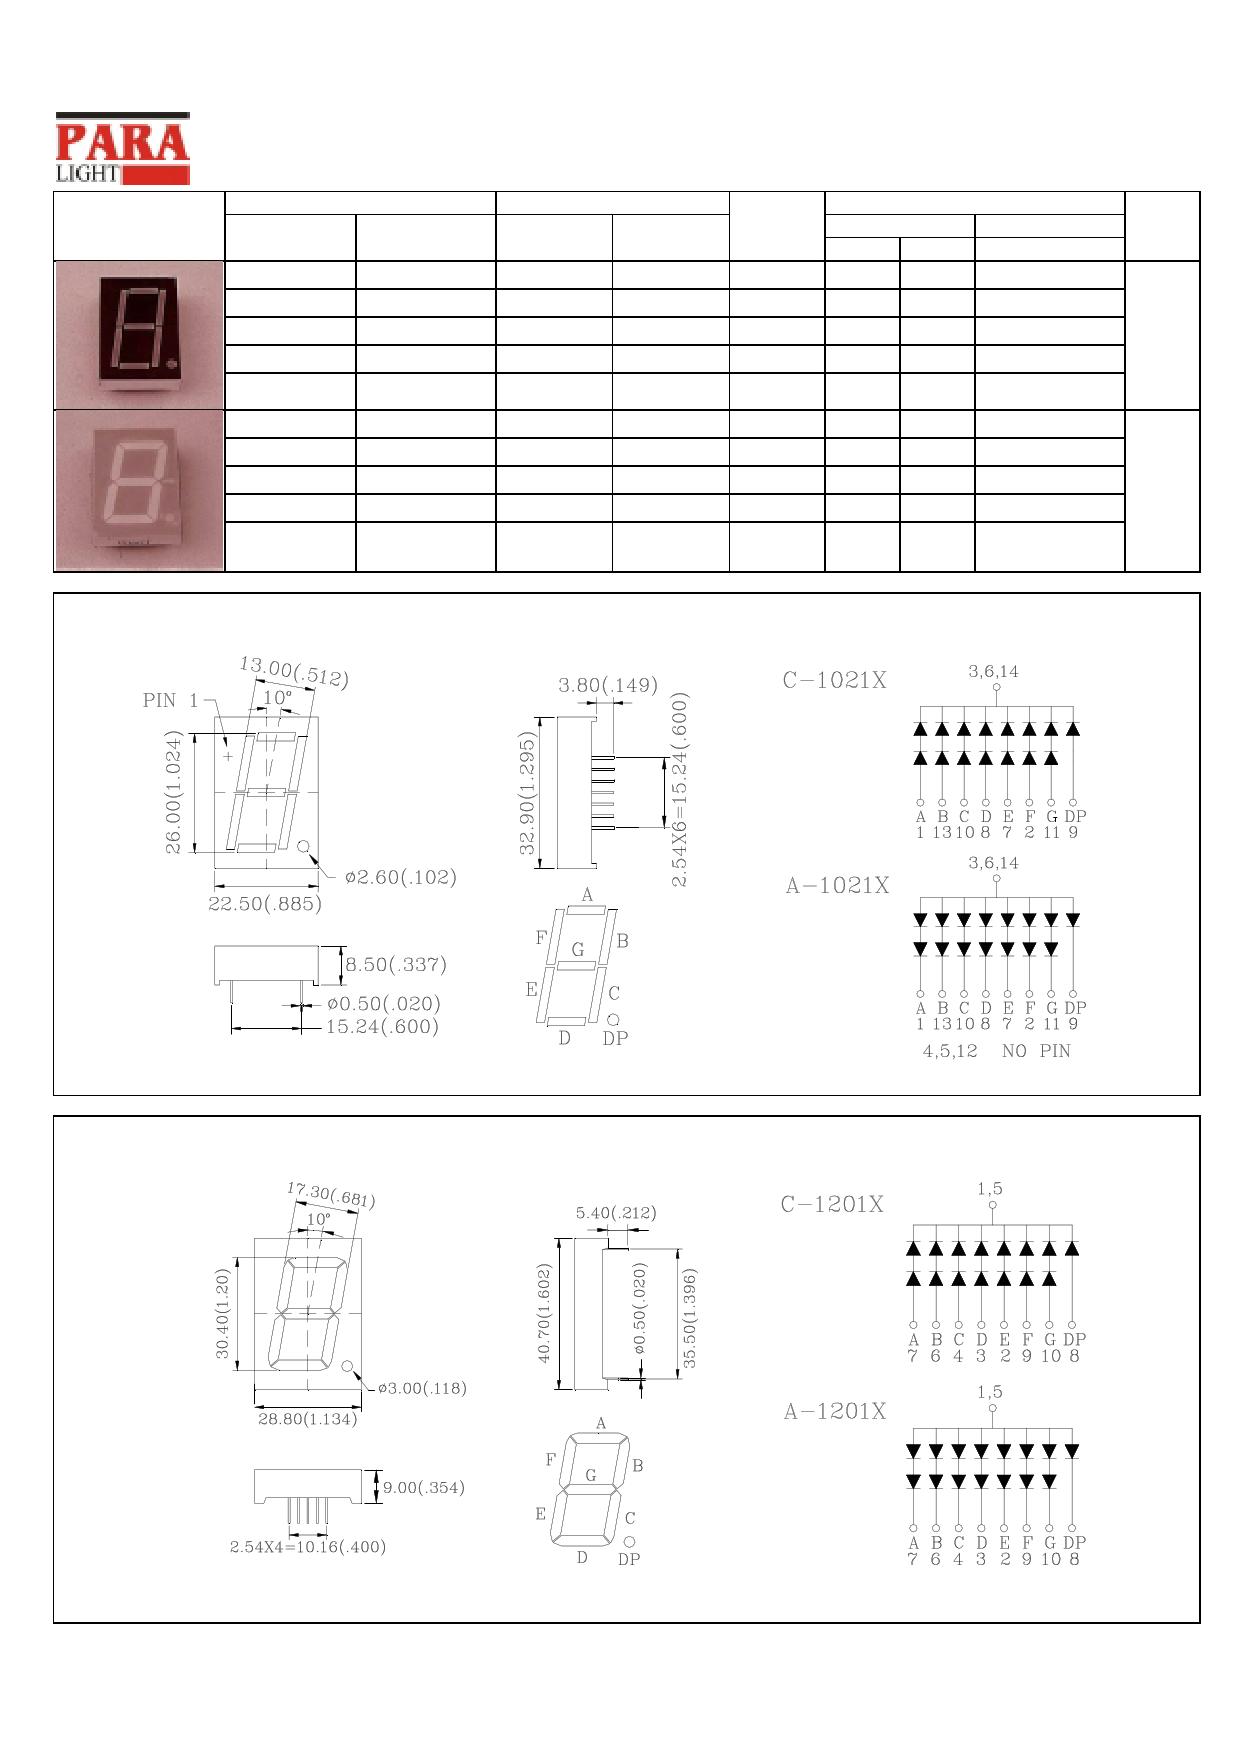 C-1201H datasheet